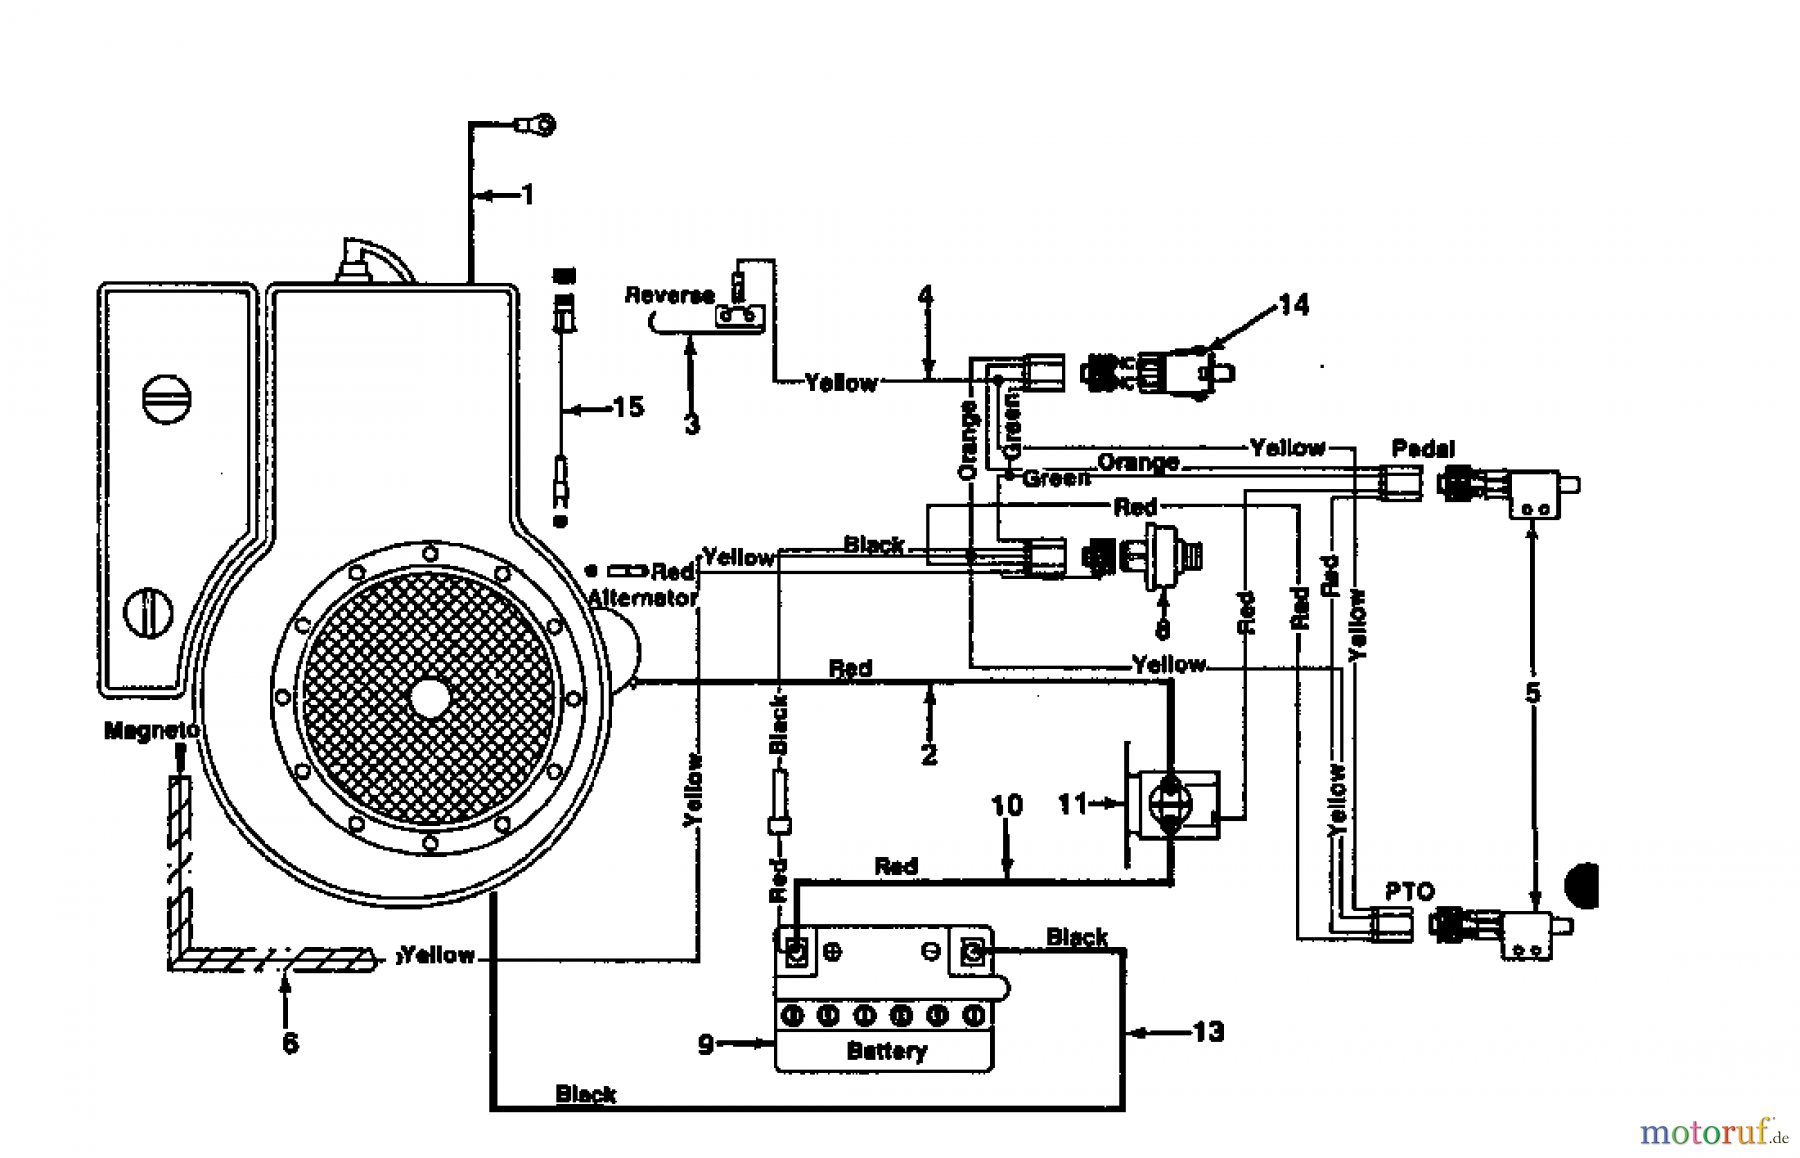 Schema electrique autoportee mtd